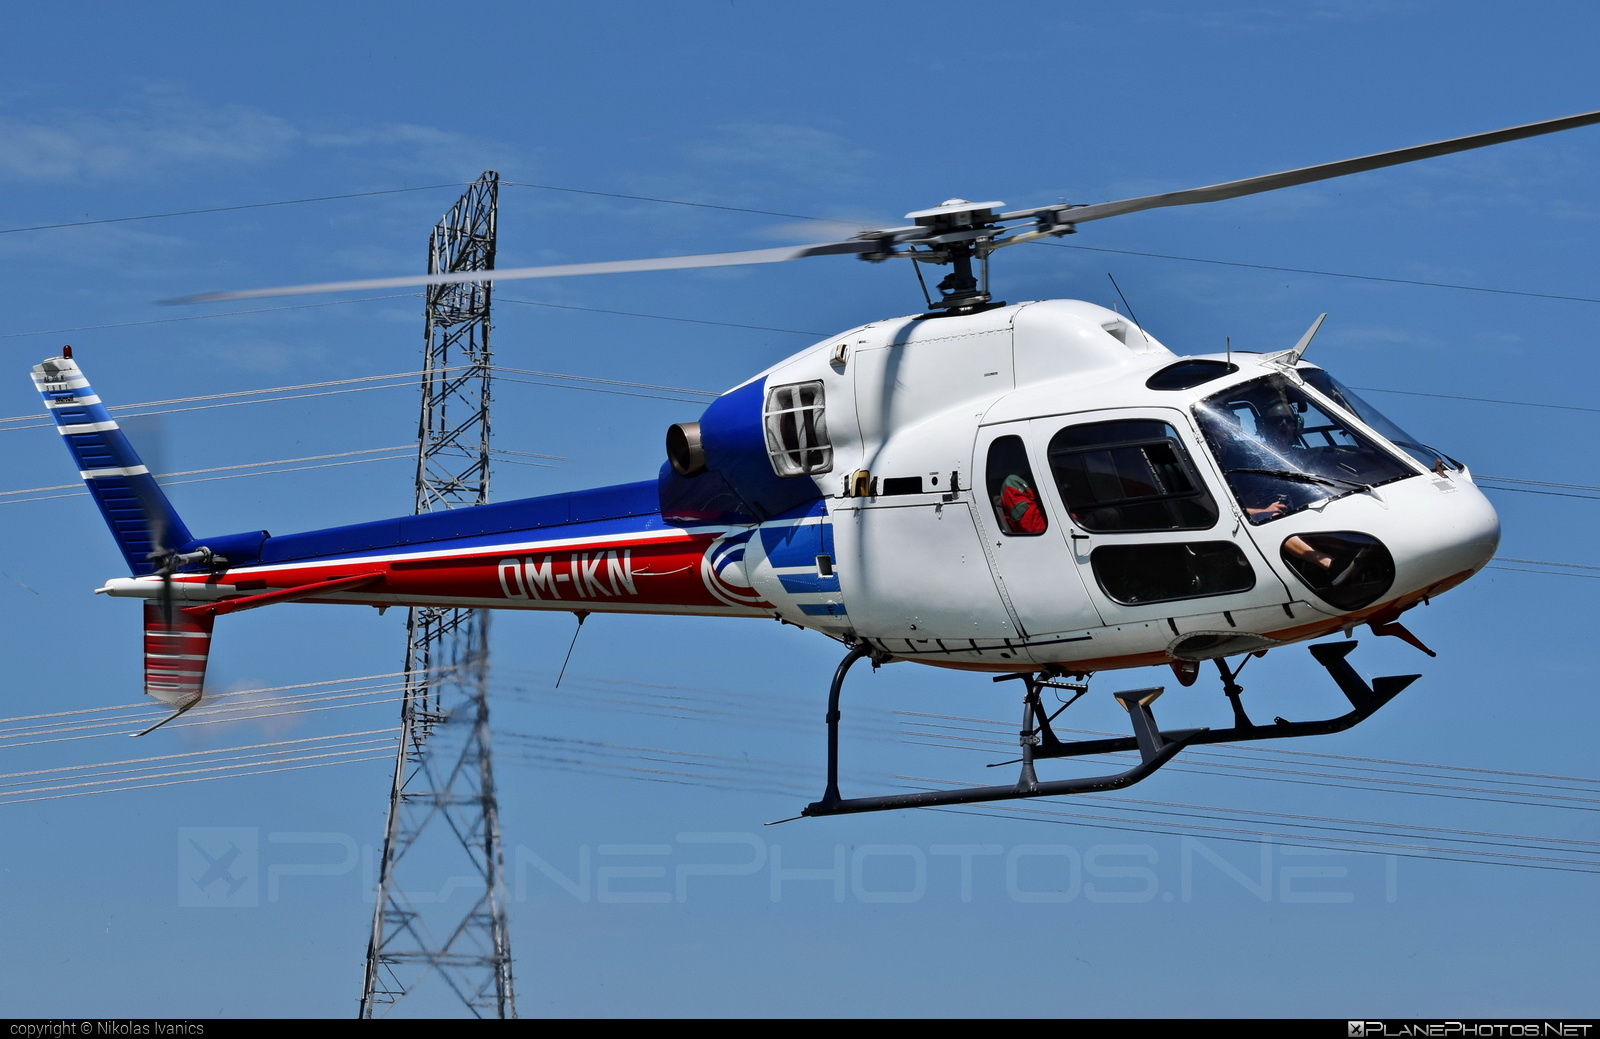 Aerospatiale AS355 Ecureuil 2 - OM-IKN operated by EHC Service #aerospatiale